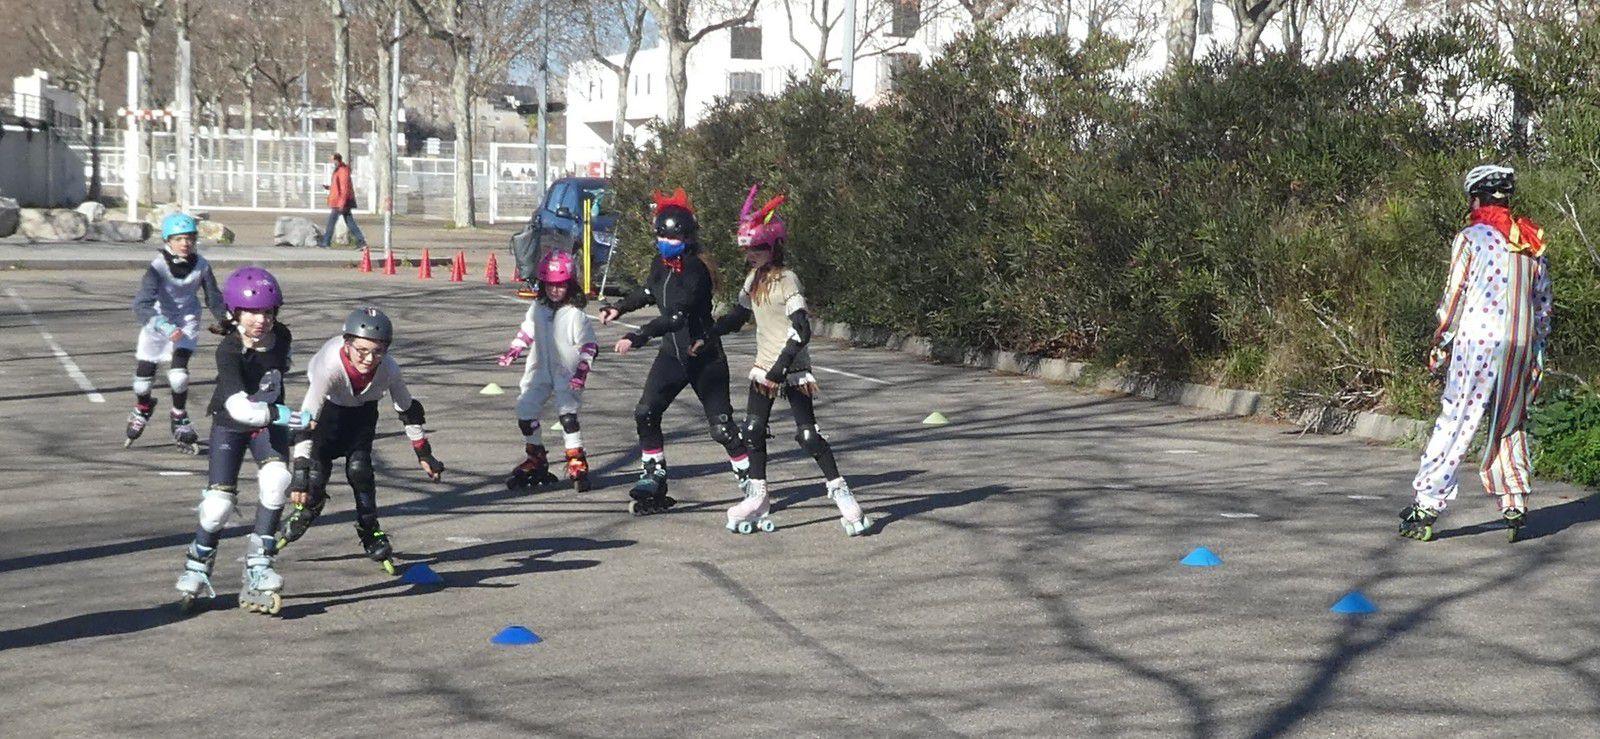 Nimes, club sports, plein air, jeu, roller lib, carnaval,